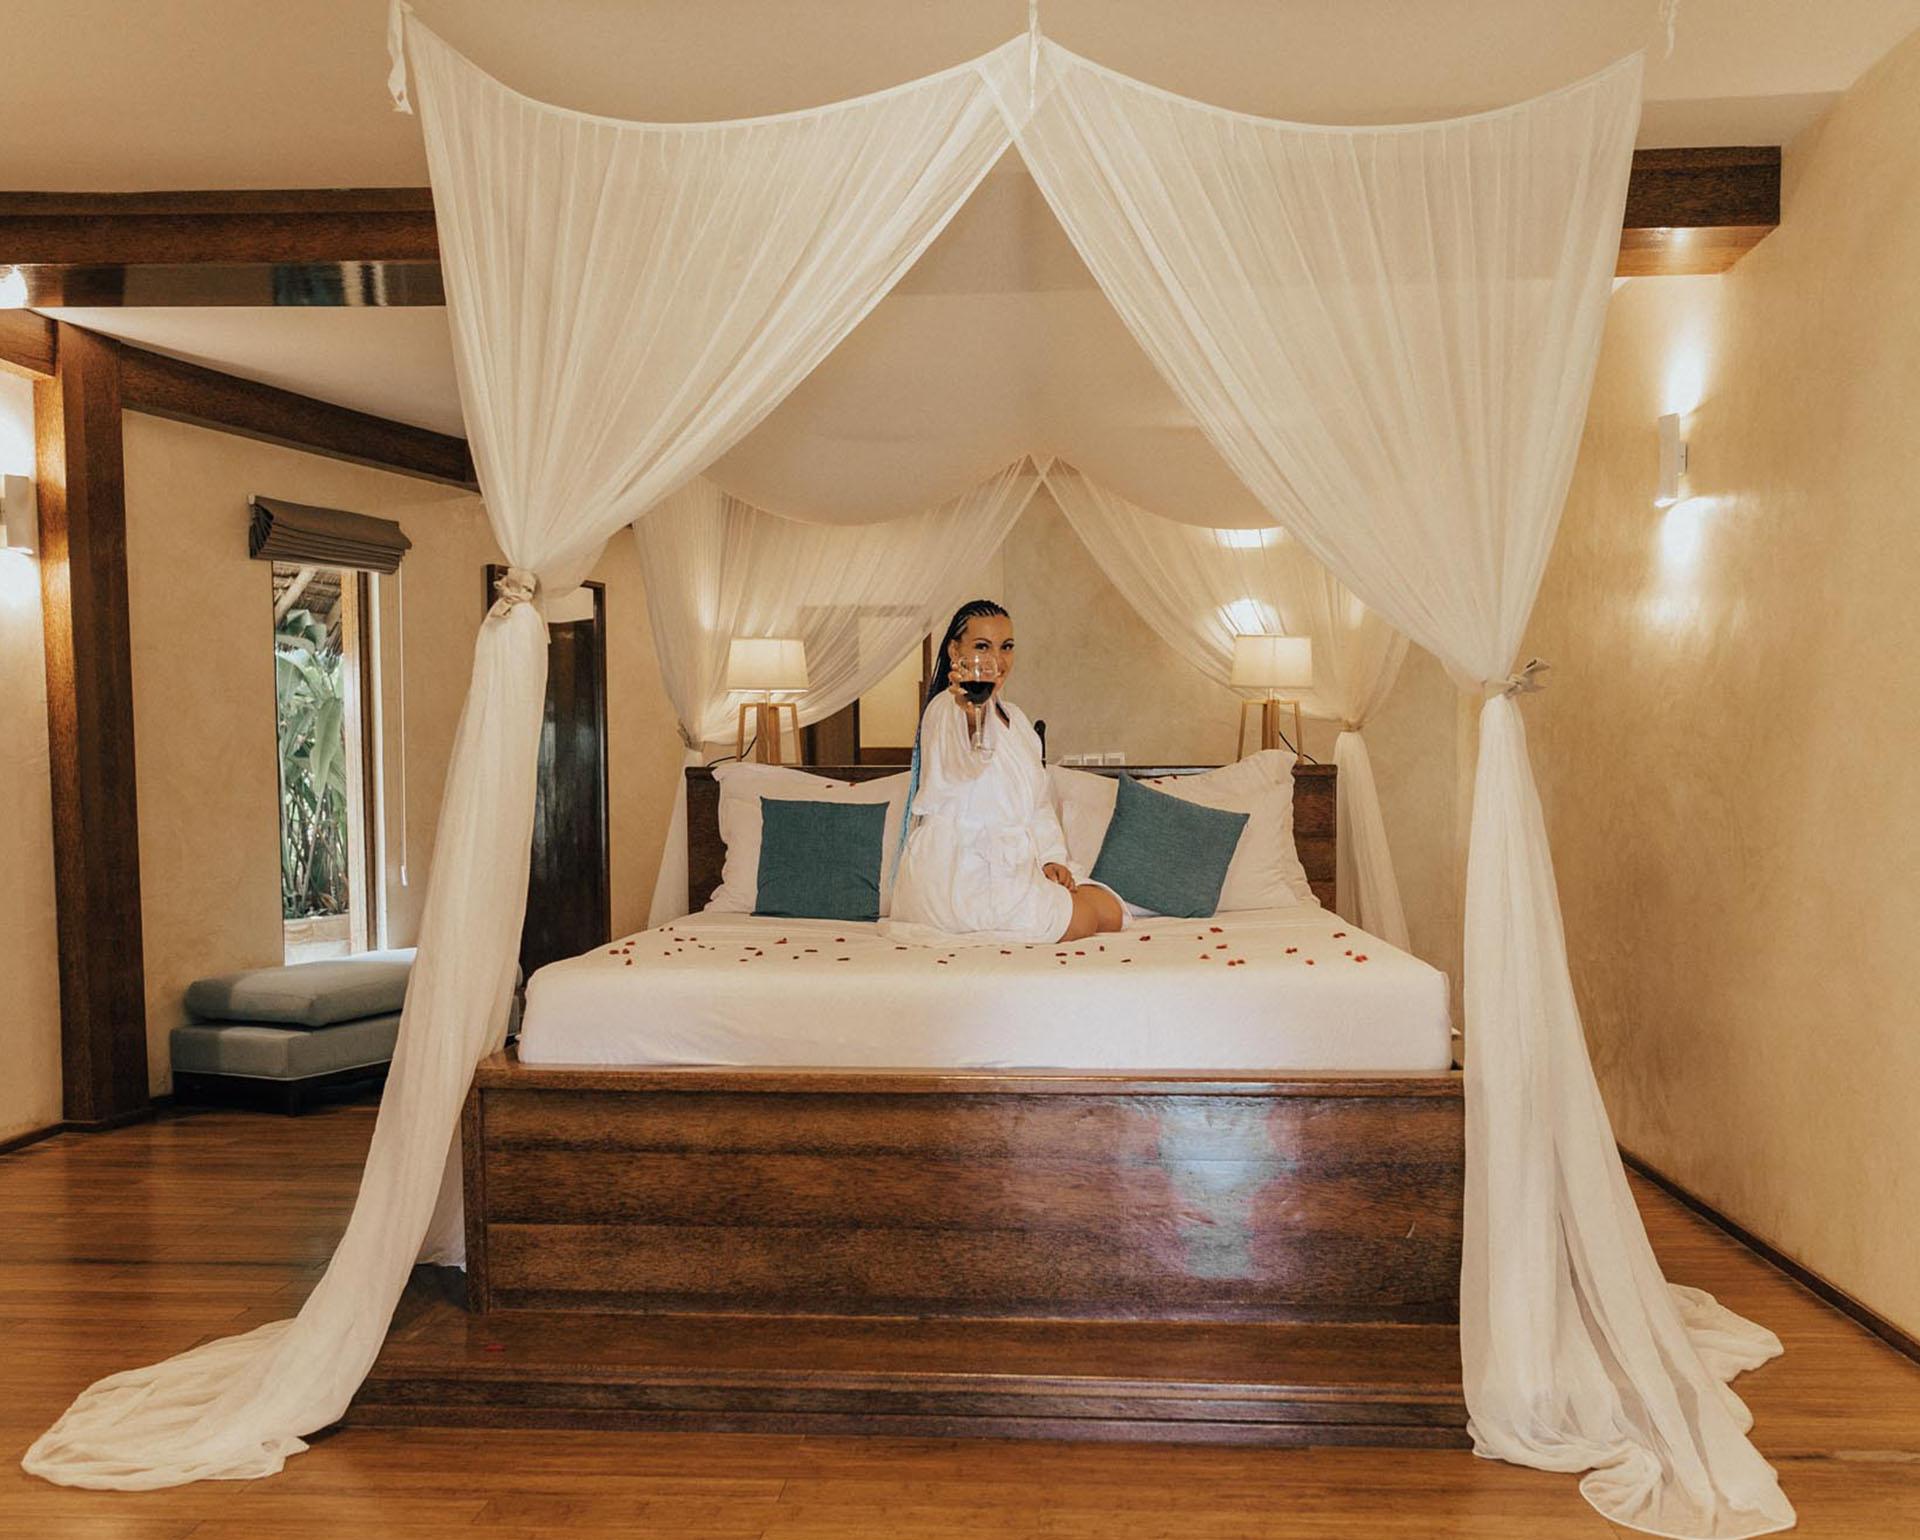 Tulia_0001_luxury_hotel_review_tulia_resort_zanzibar_lux_hotels_tanzania1